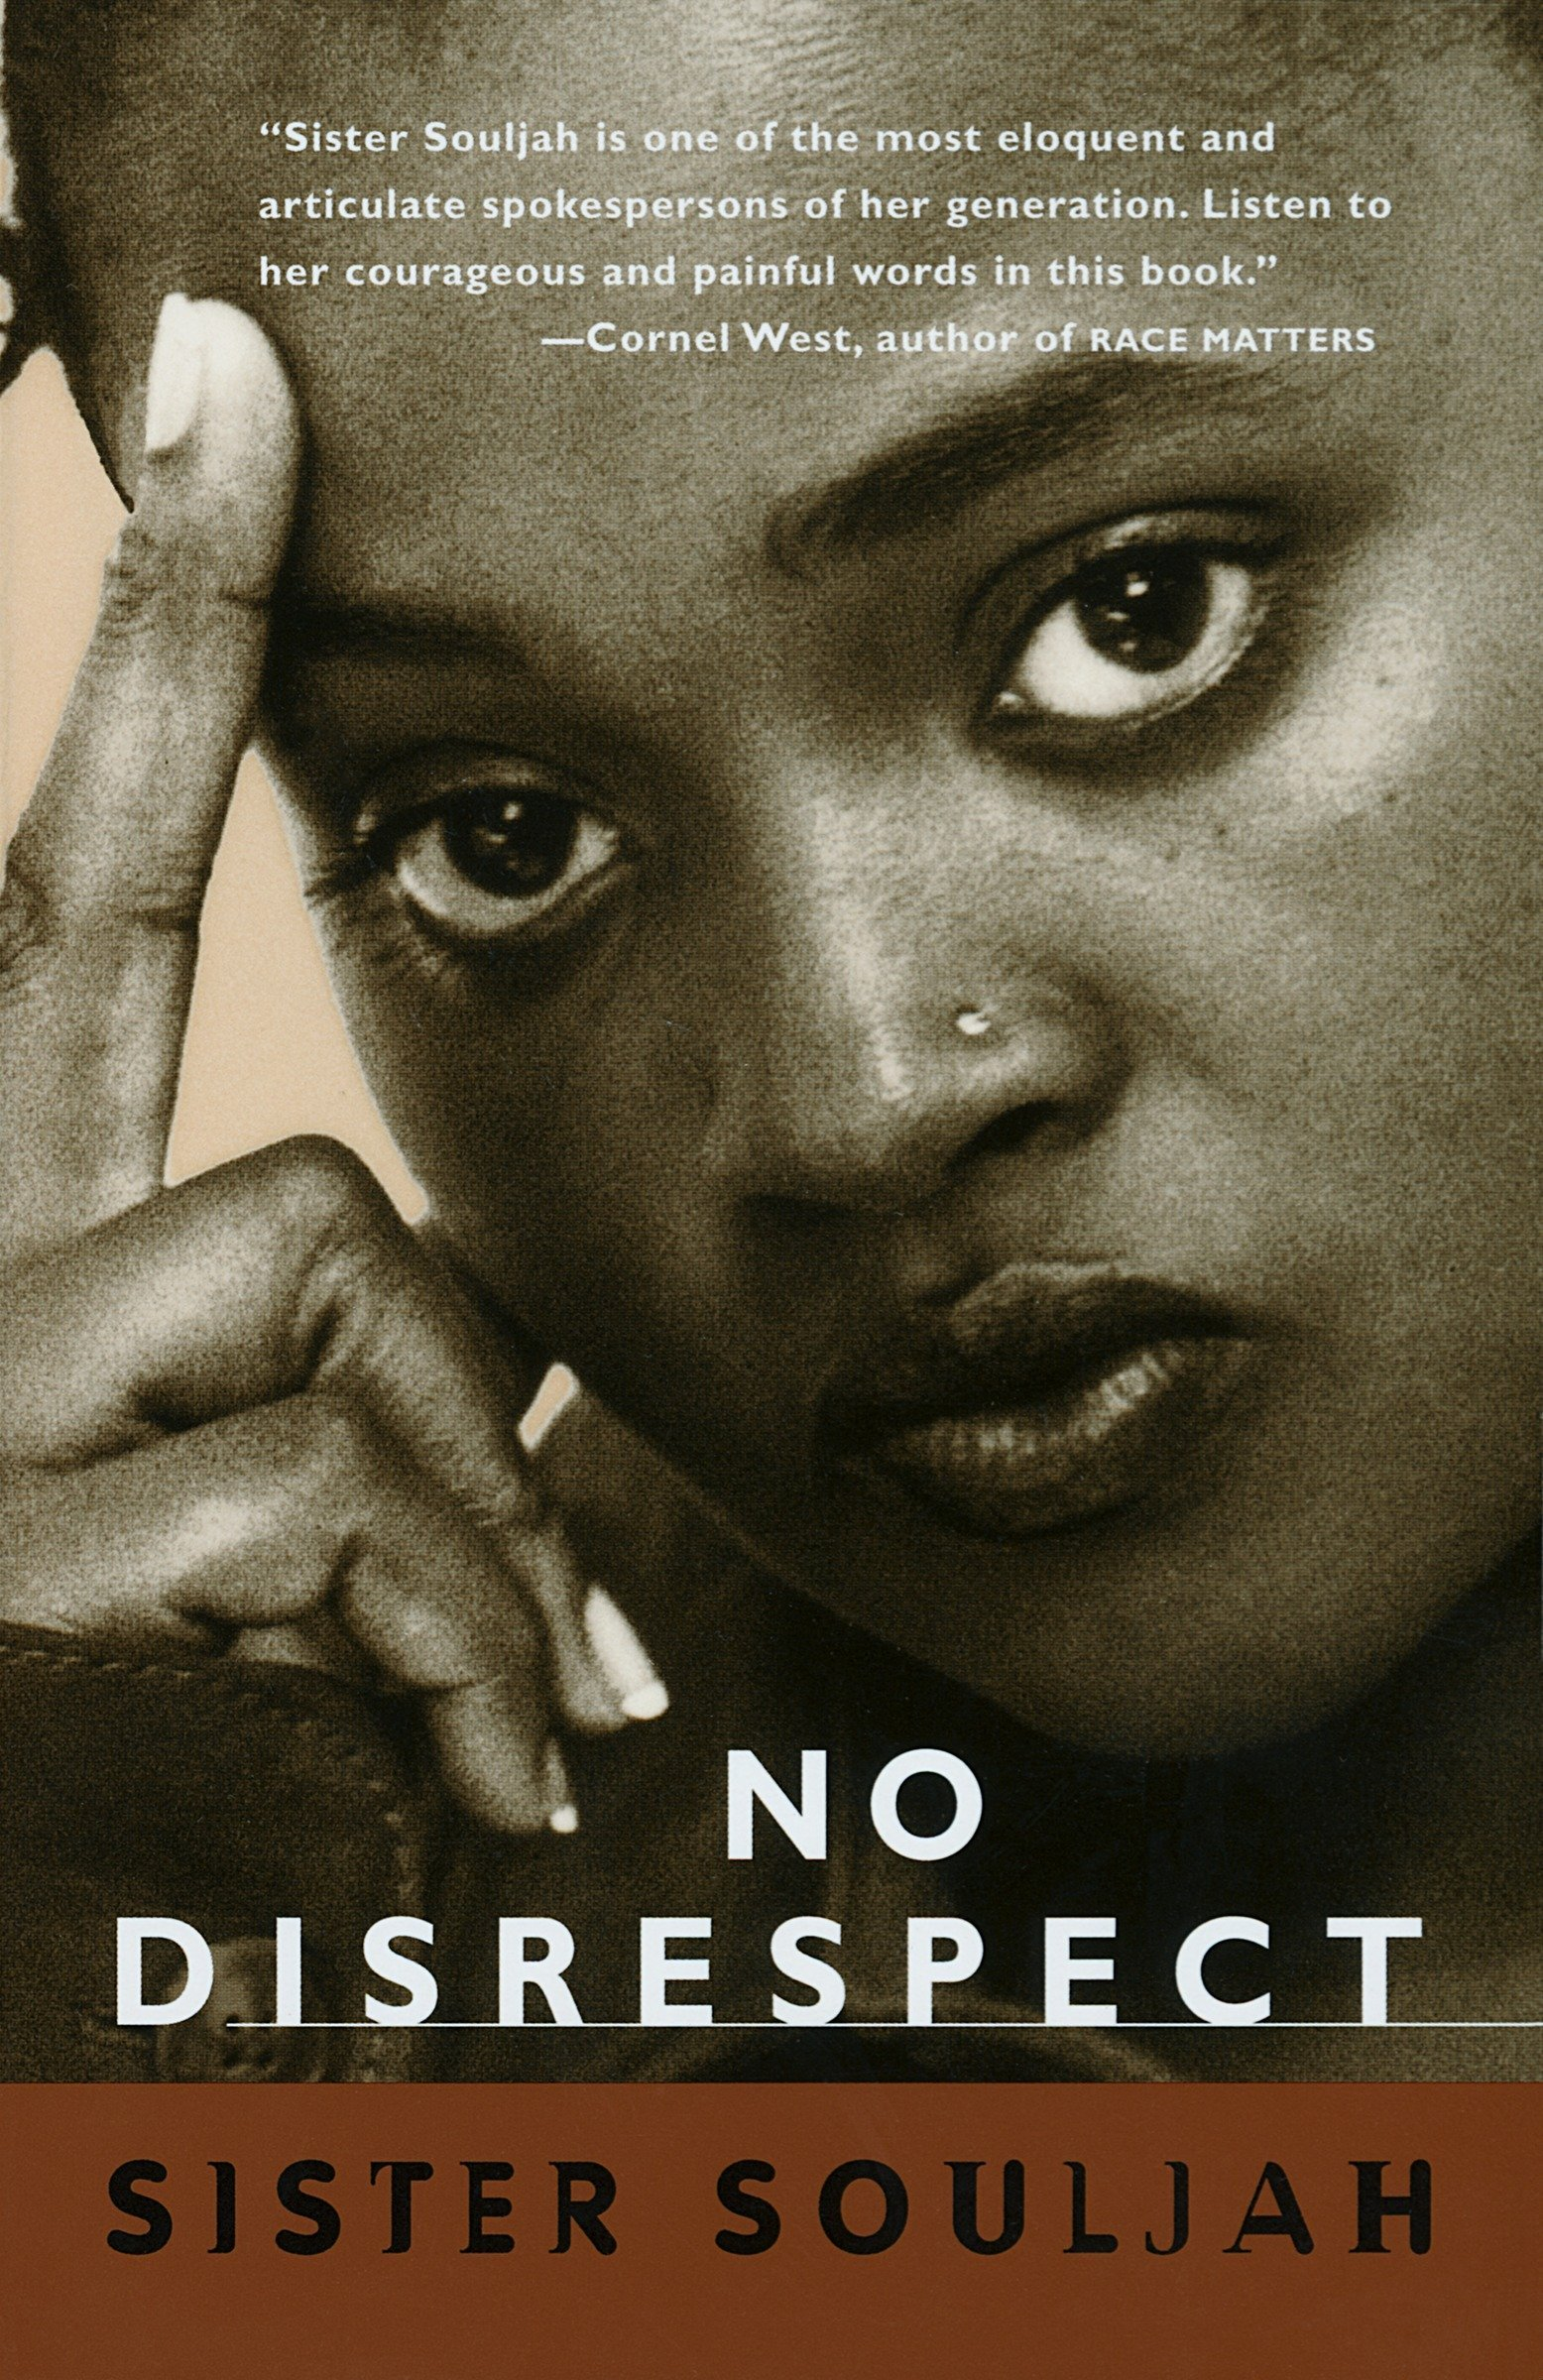 no disrespect sister souljah 9780679767084 amazon com books